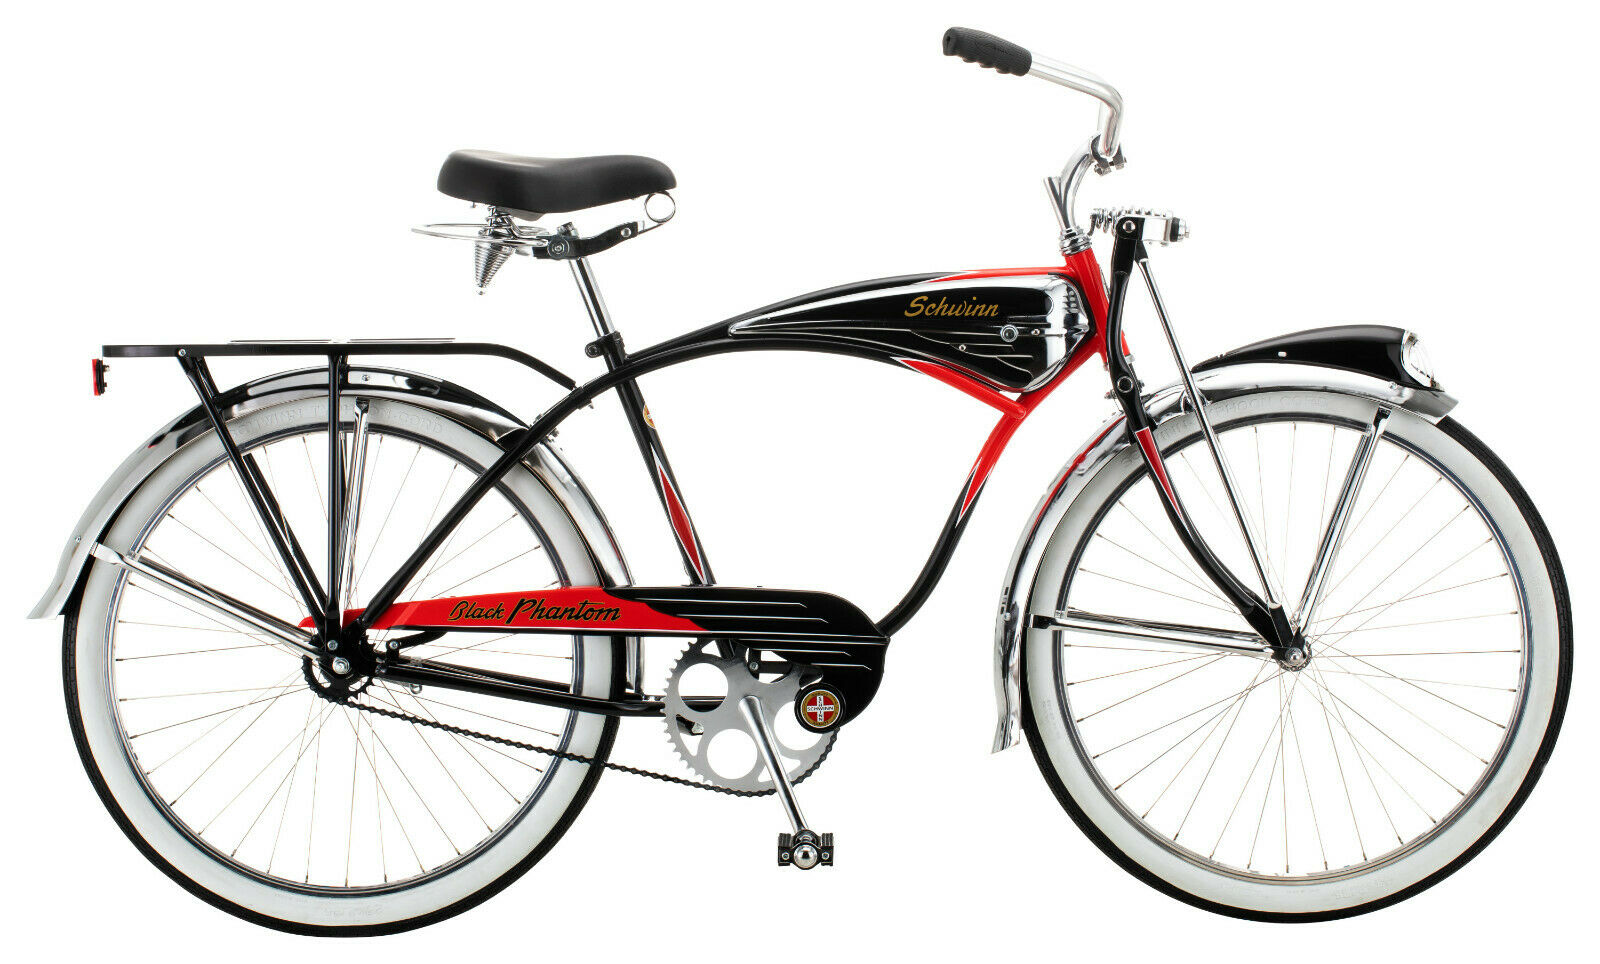 Schwinn Black Phantom Cruiser Bike, single speed, 26-inch wheels 125 Anniversary (New - 1199.99 USD)